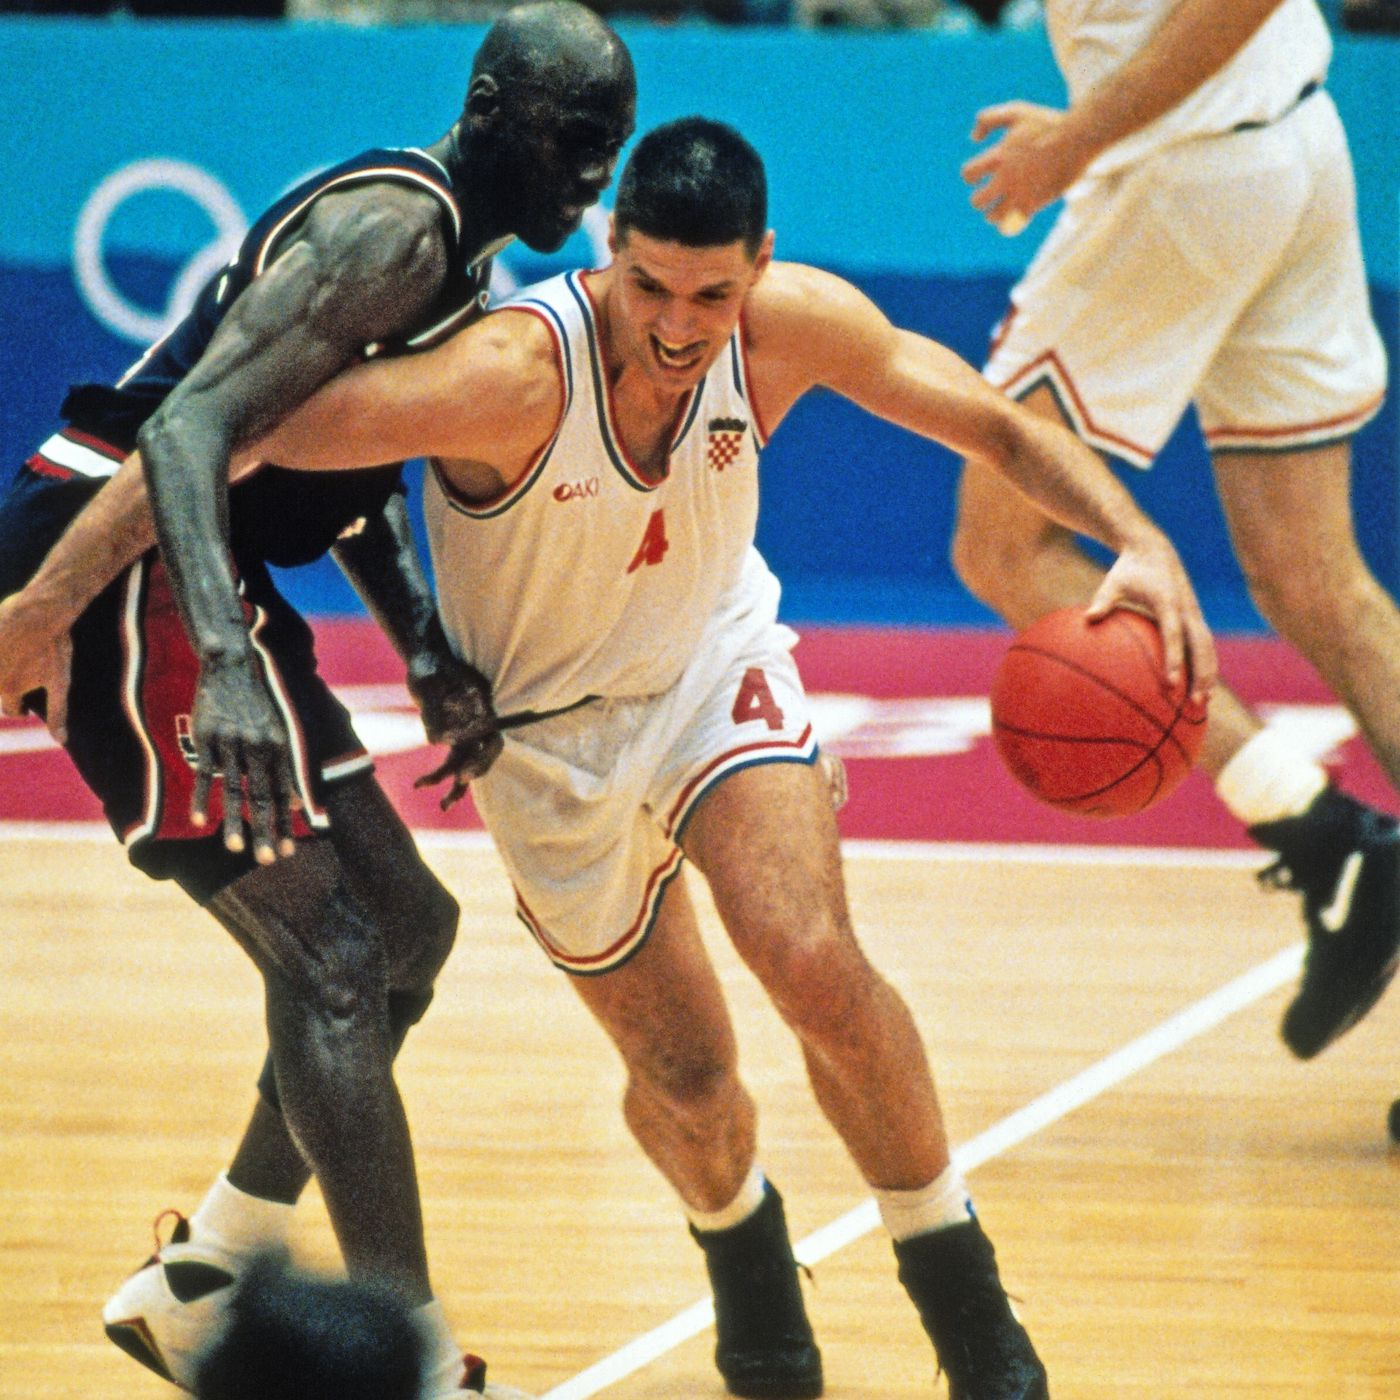 coser Hervir Roux  You Tube Gold: Drazen Petrovic Changed Basketball Globally - Duke  Basketball Report